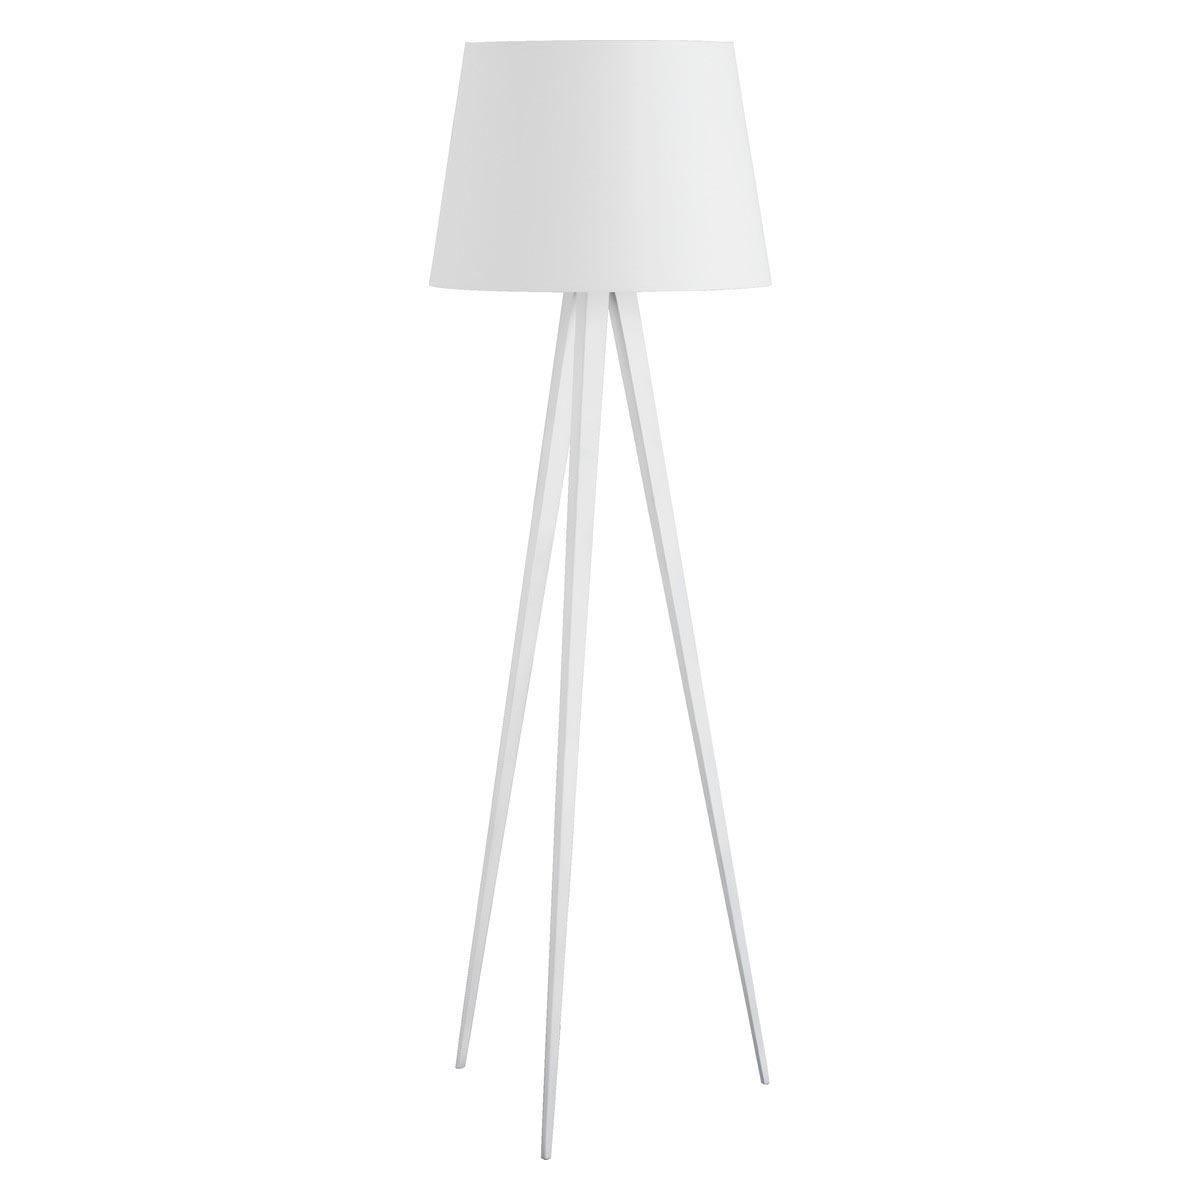 Silver Tripod Floor Lamp